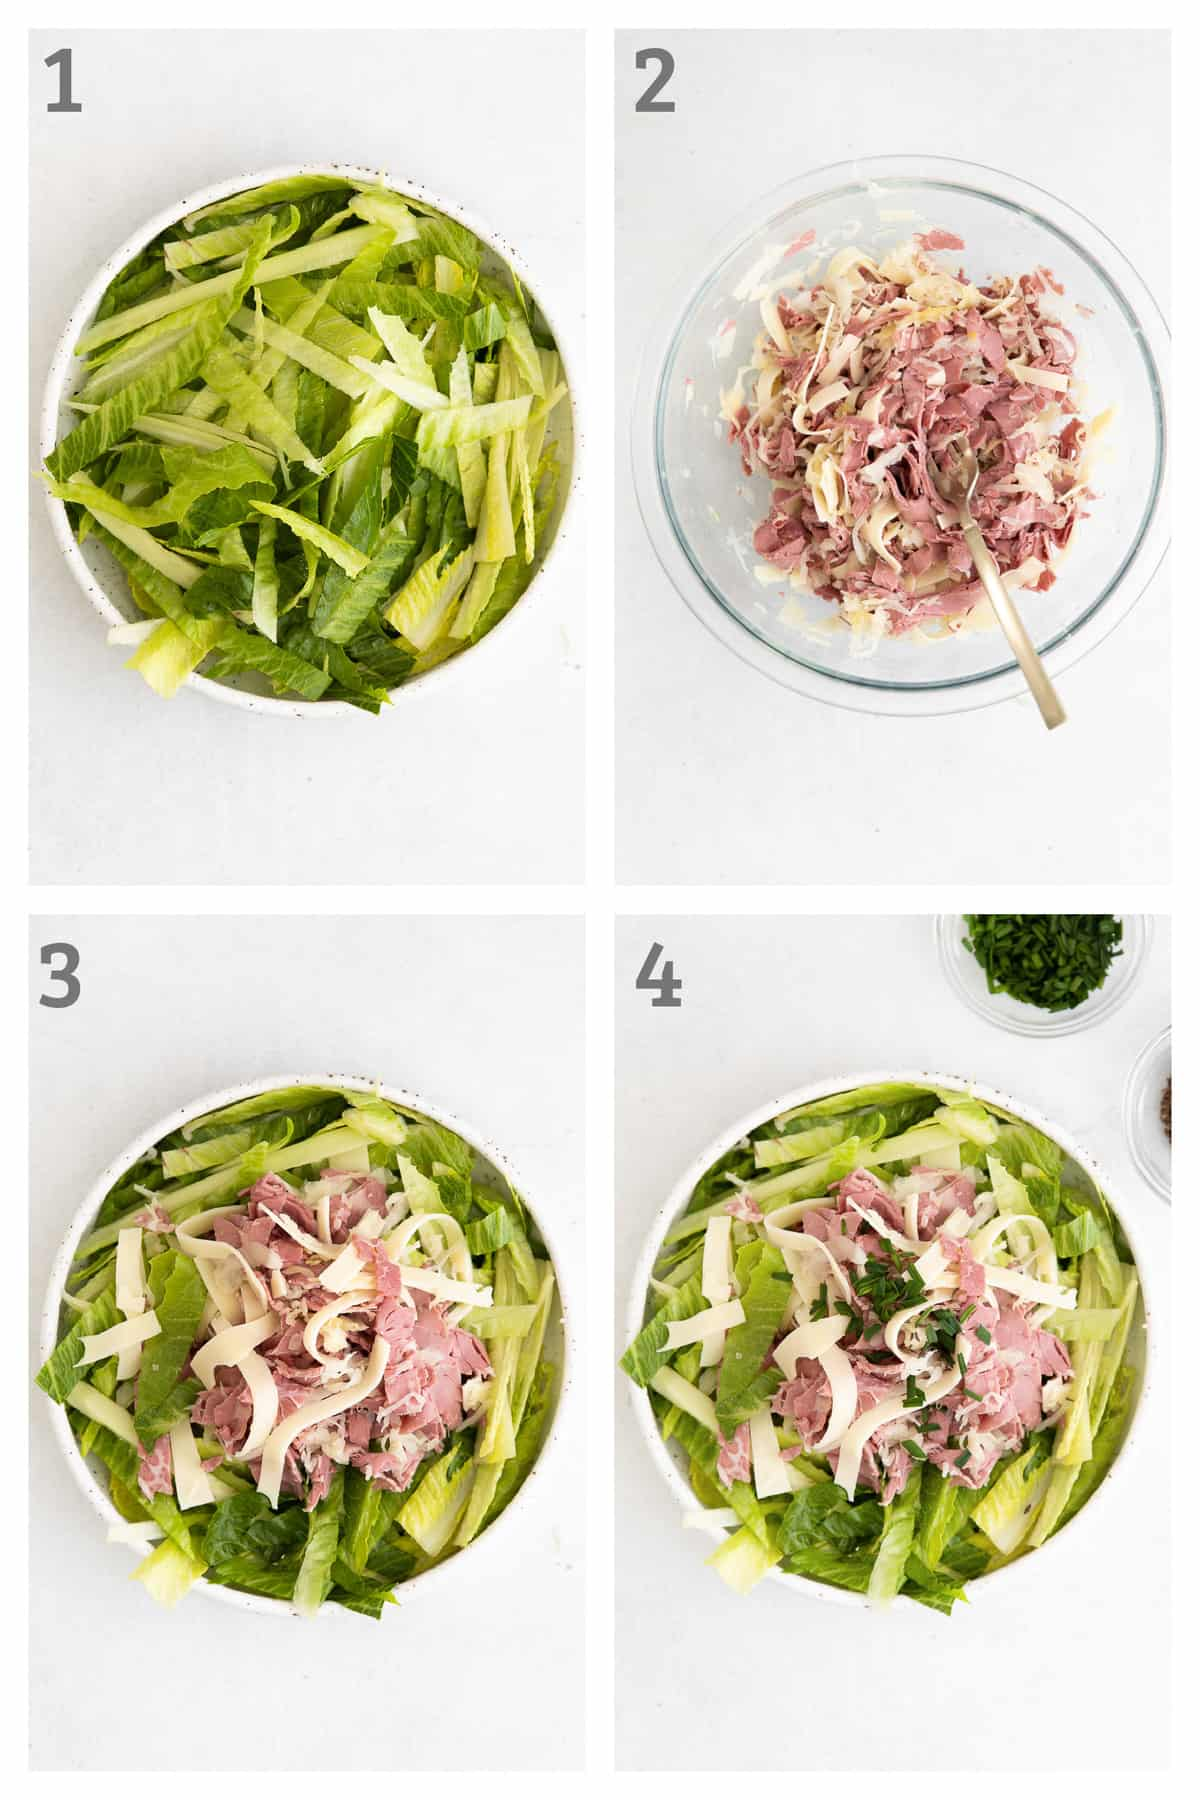 reuben chopped salad in a white ceramic bowl - romaine, corned beef, sauerkraut, and Russian dressing